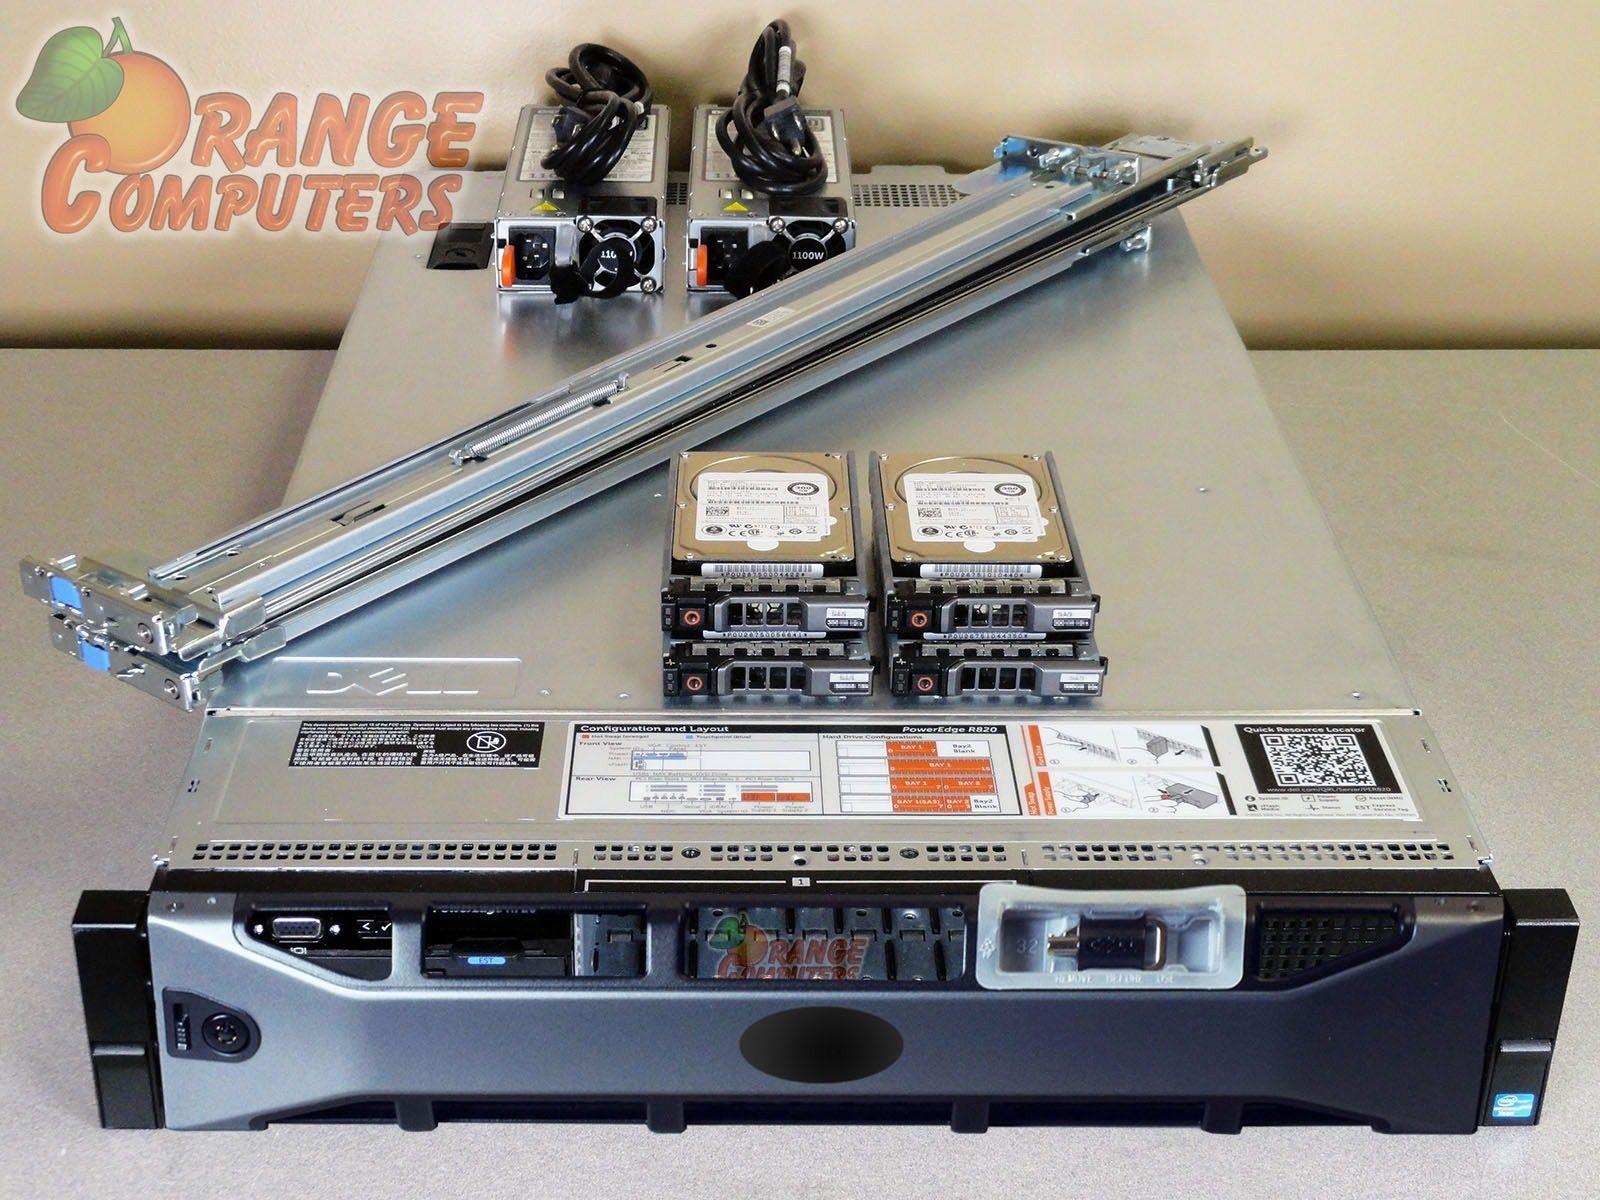 Dell PowerEdge R820 Server Four E54620 8 Core 2.2GHz